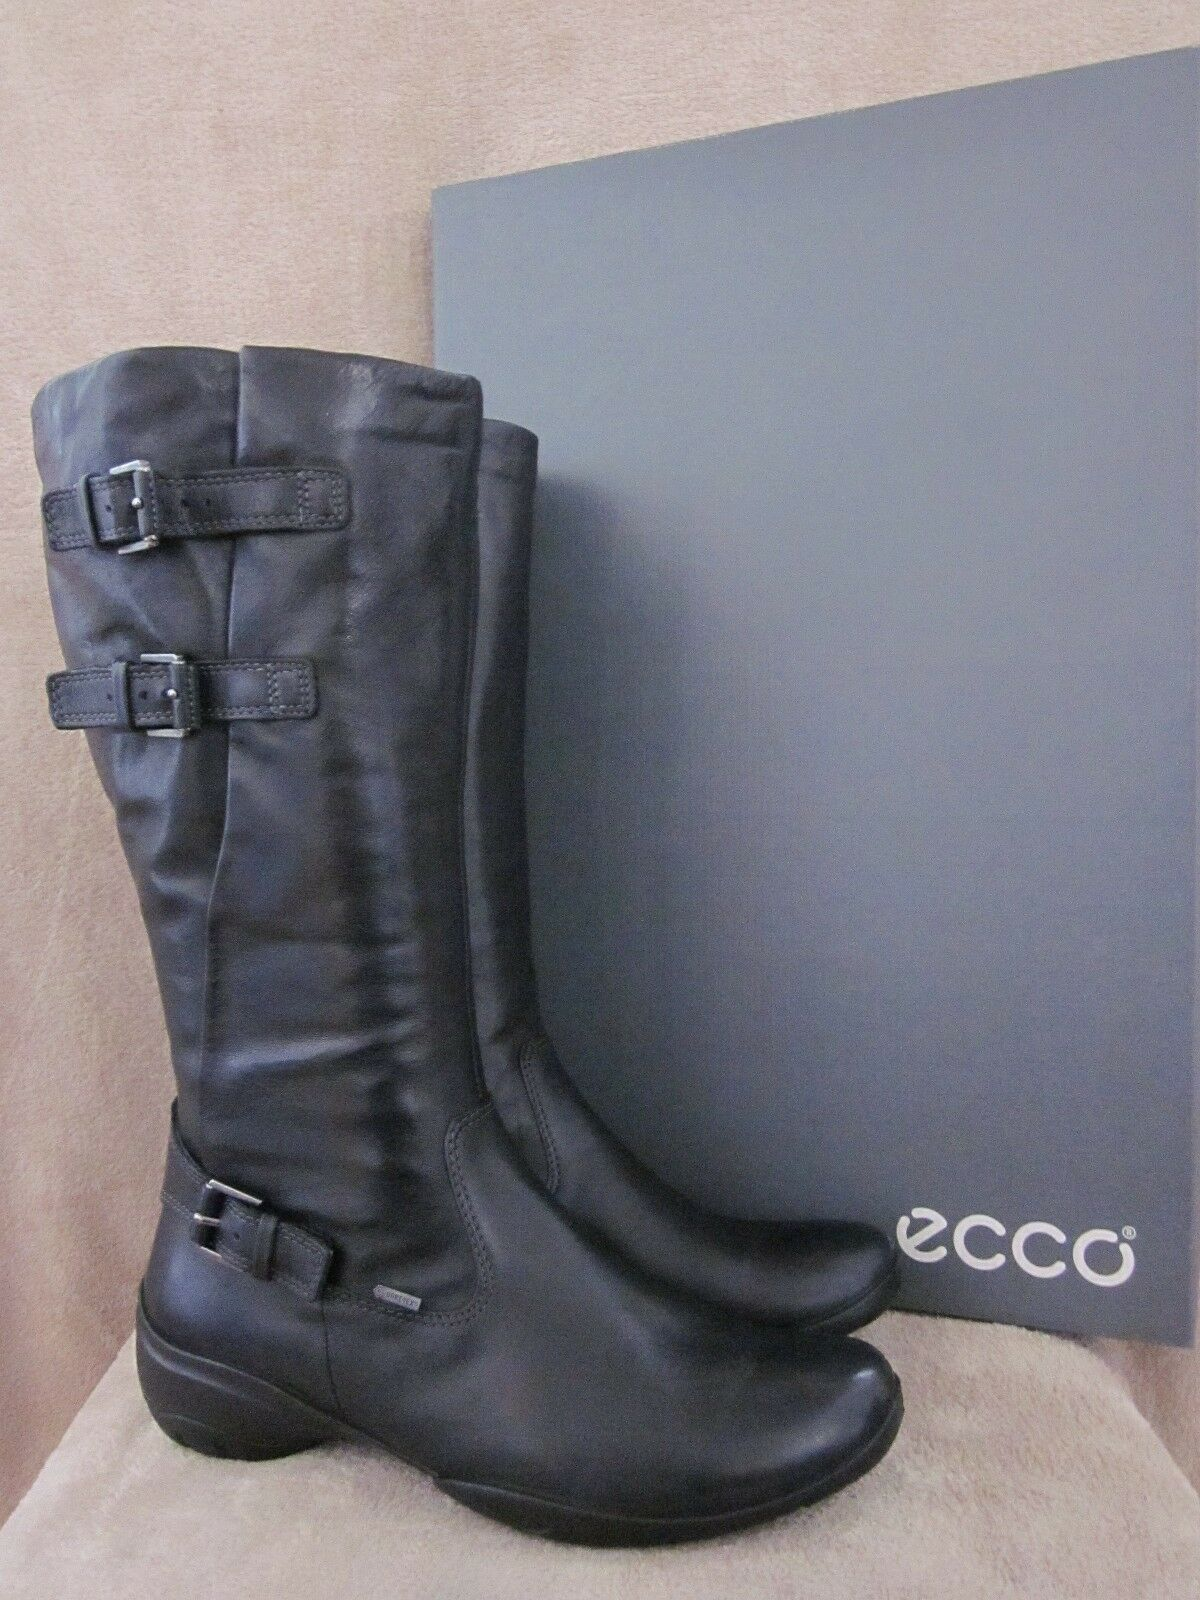 ECCO Rise Black High Cut Leather Buckle Zip Boots shoes US 9 - 9.5 M EUR 40 NWB